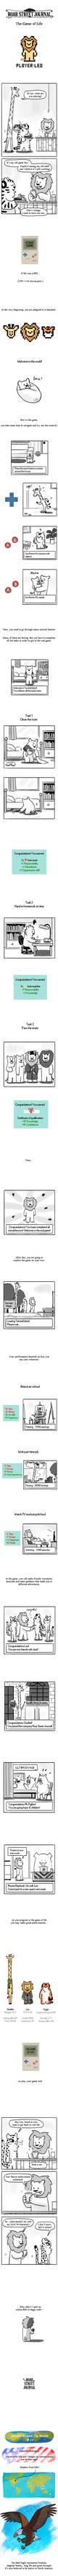 [RSJ webtoon] The Game of Life